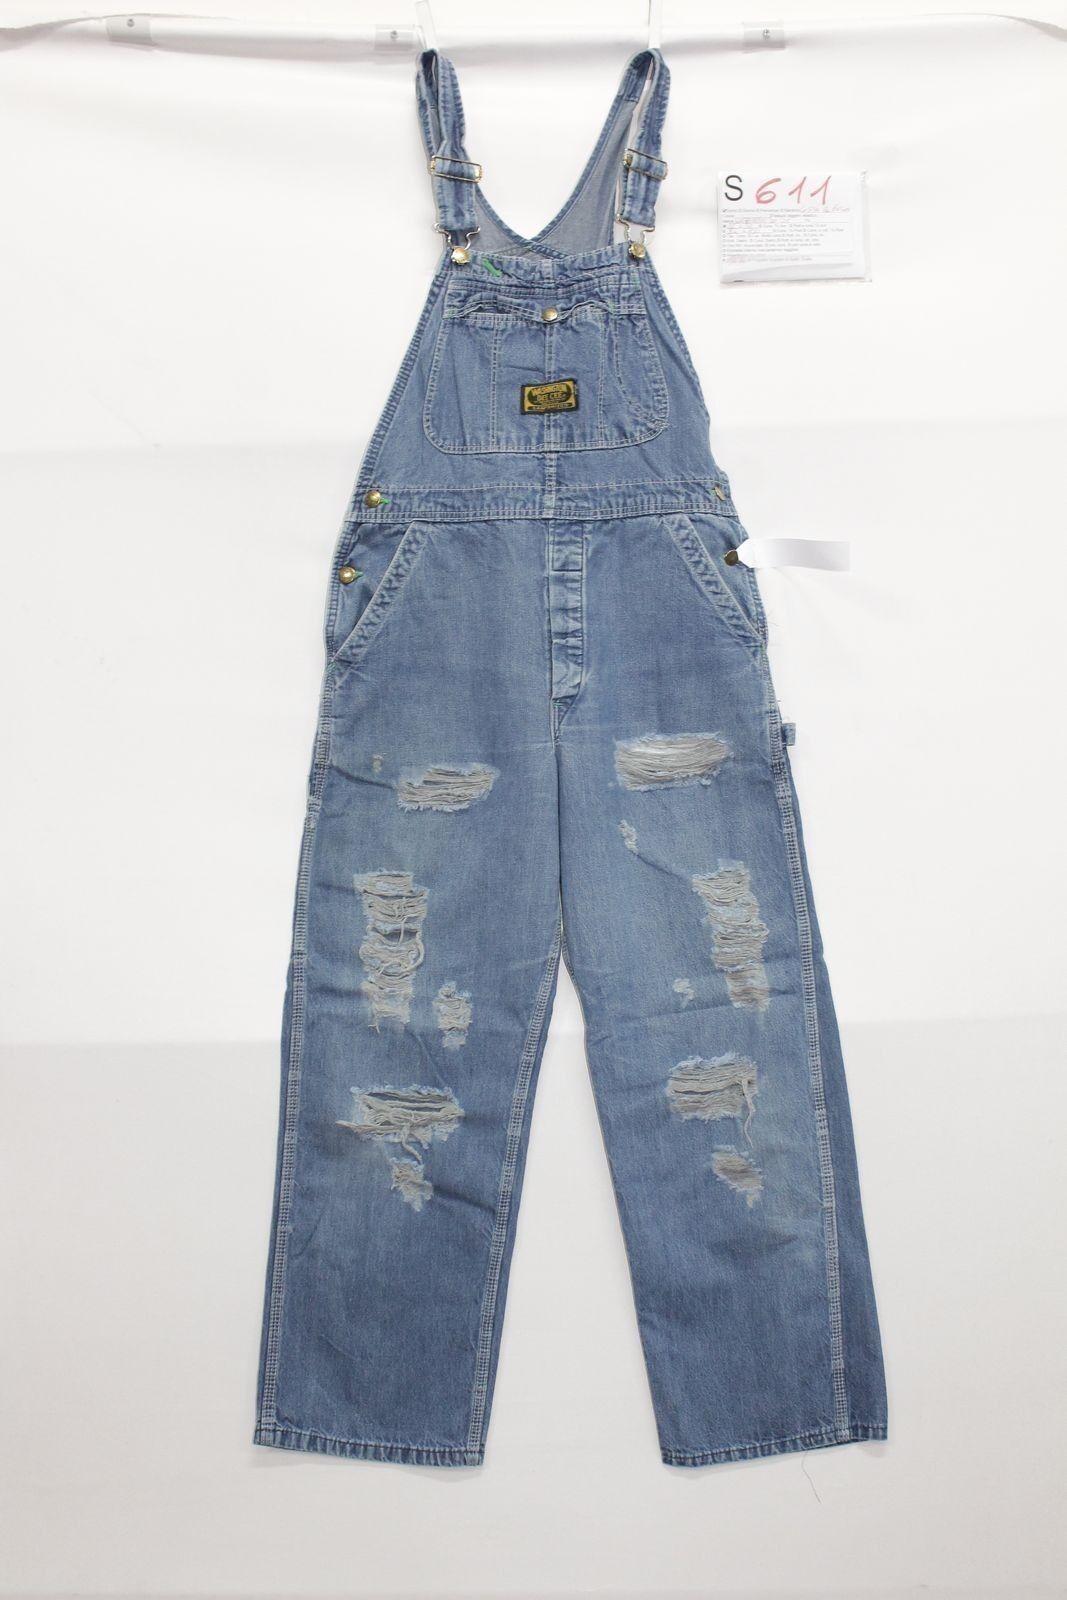 Salopette Washington jeans dee eec avec rupture boyfriend jeans Washington Cod.S611 Taille W32 6dd404